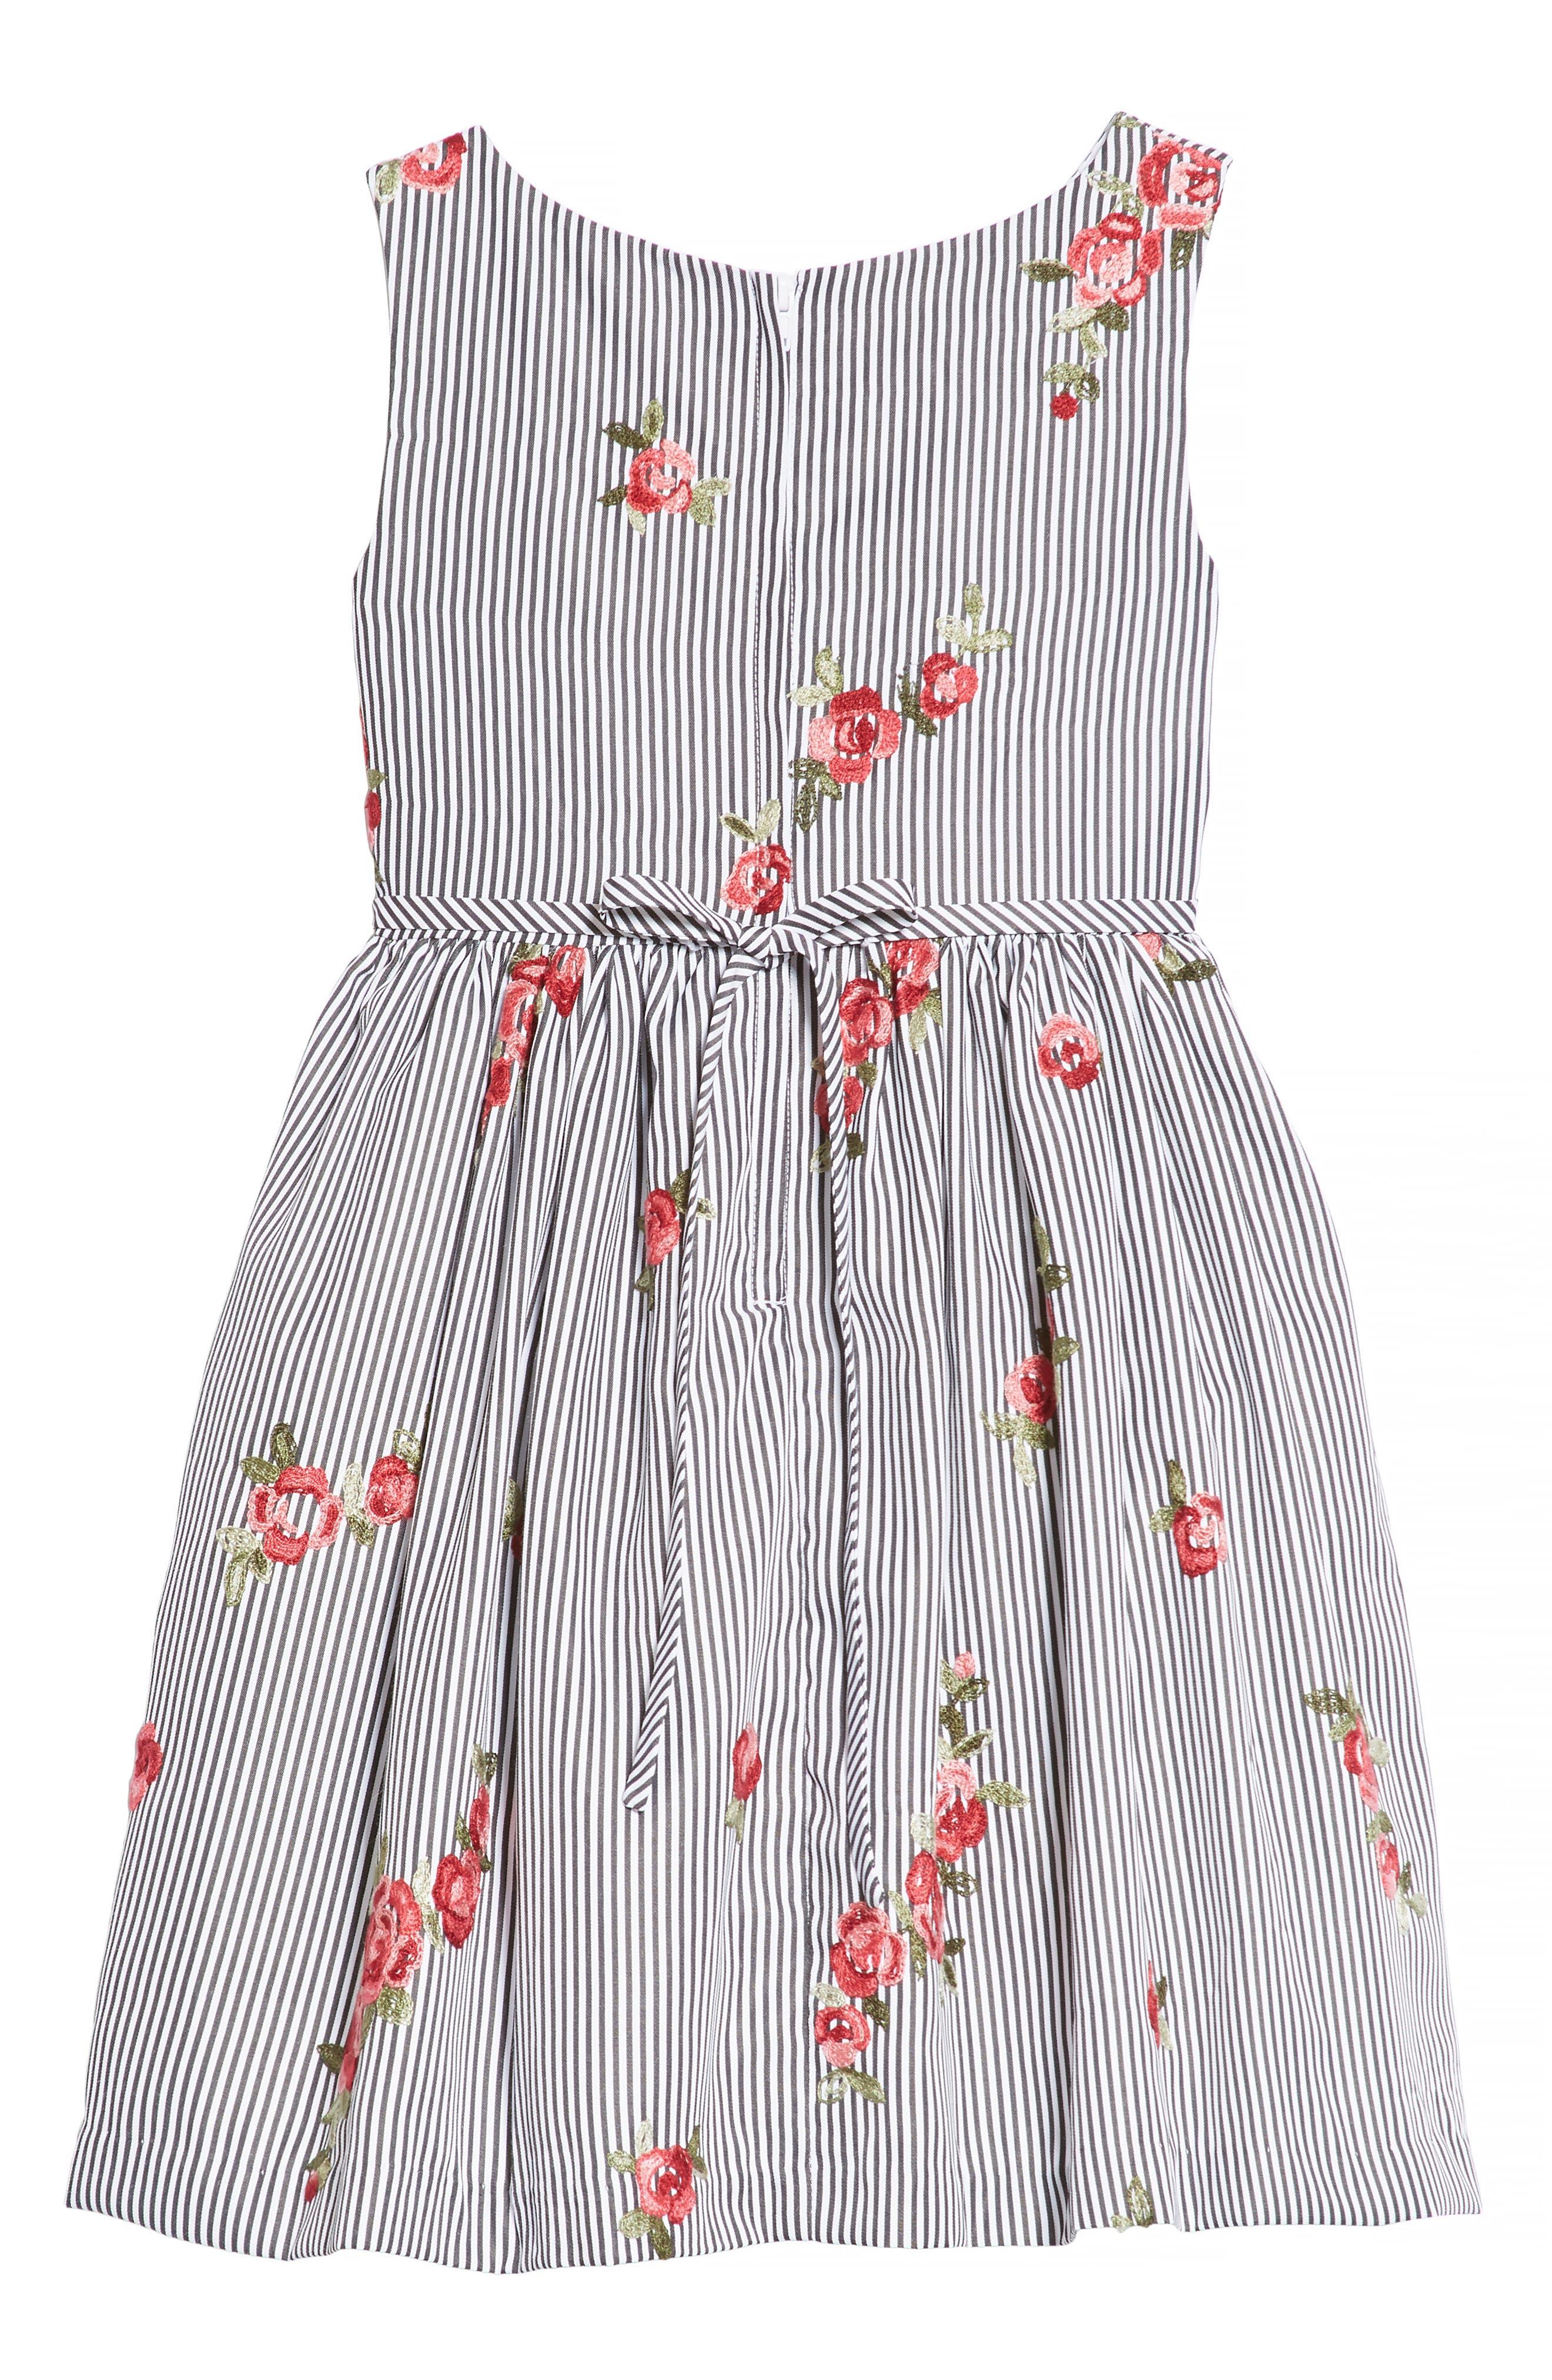 Embroidered Stripe Dress,                             Alternate thumbnail 2, color,                             Black/ White